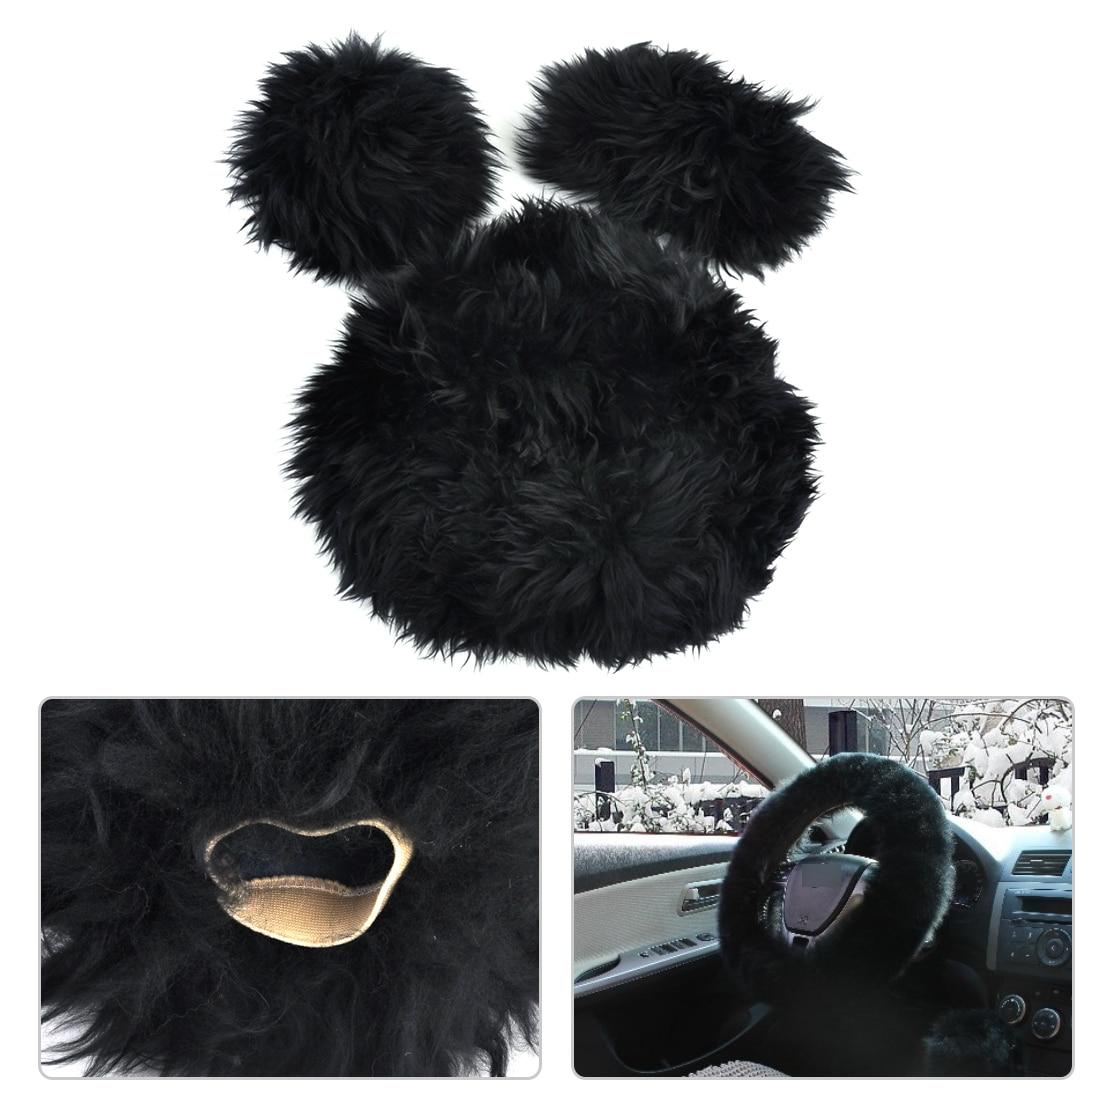 beler Black Long Soft Wool Plush Fuzzy Warm Steering Wheel Handbrake Gear Shift Cover Car Grips Accessory Winter For VW Audi